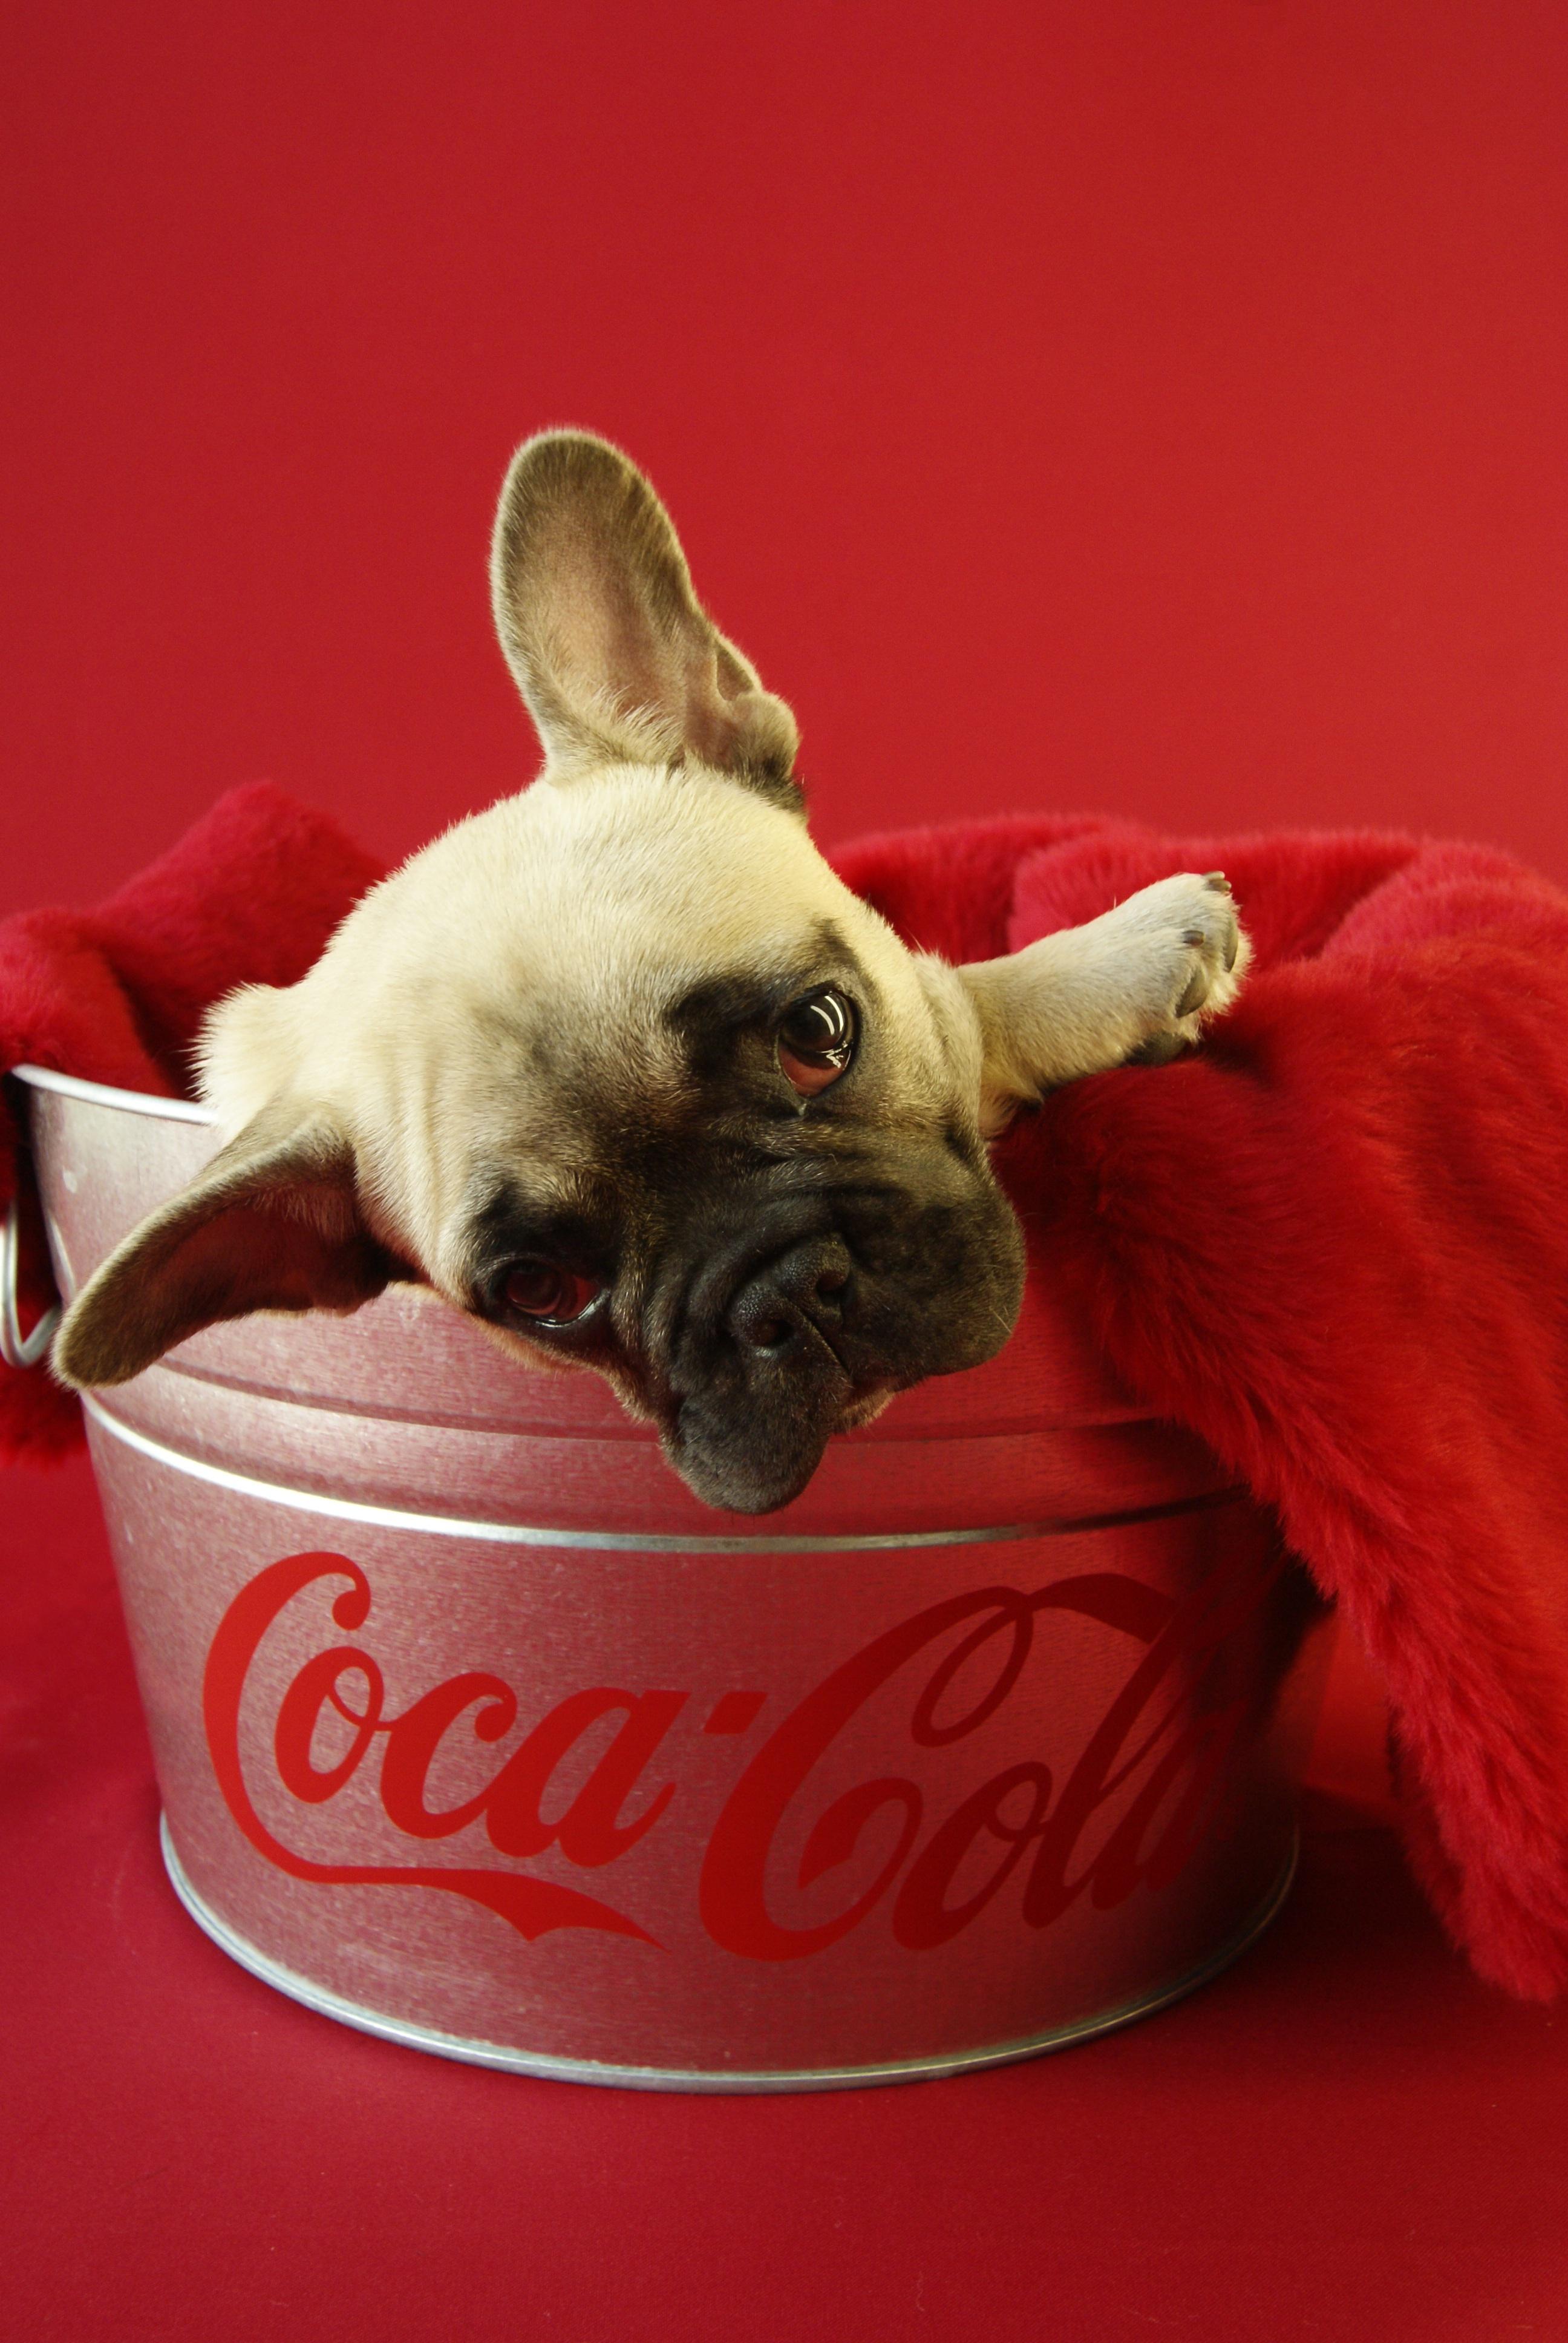 Kostenlose Foto Welpe Tier Niedlich Haustier Rot